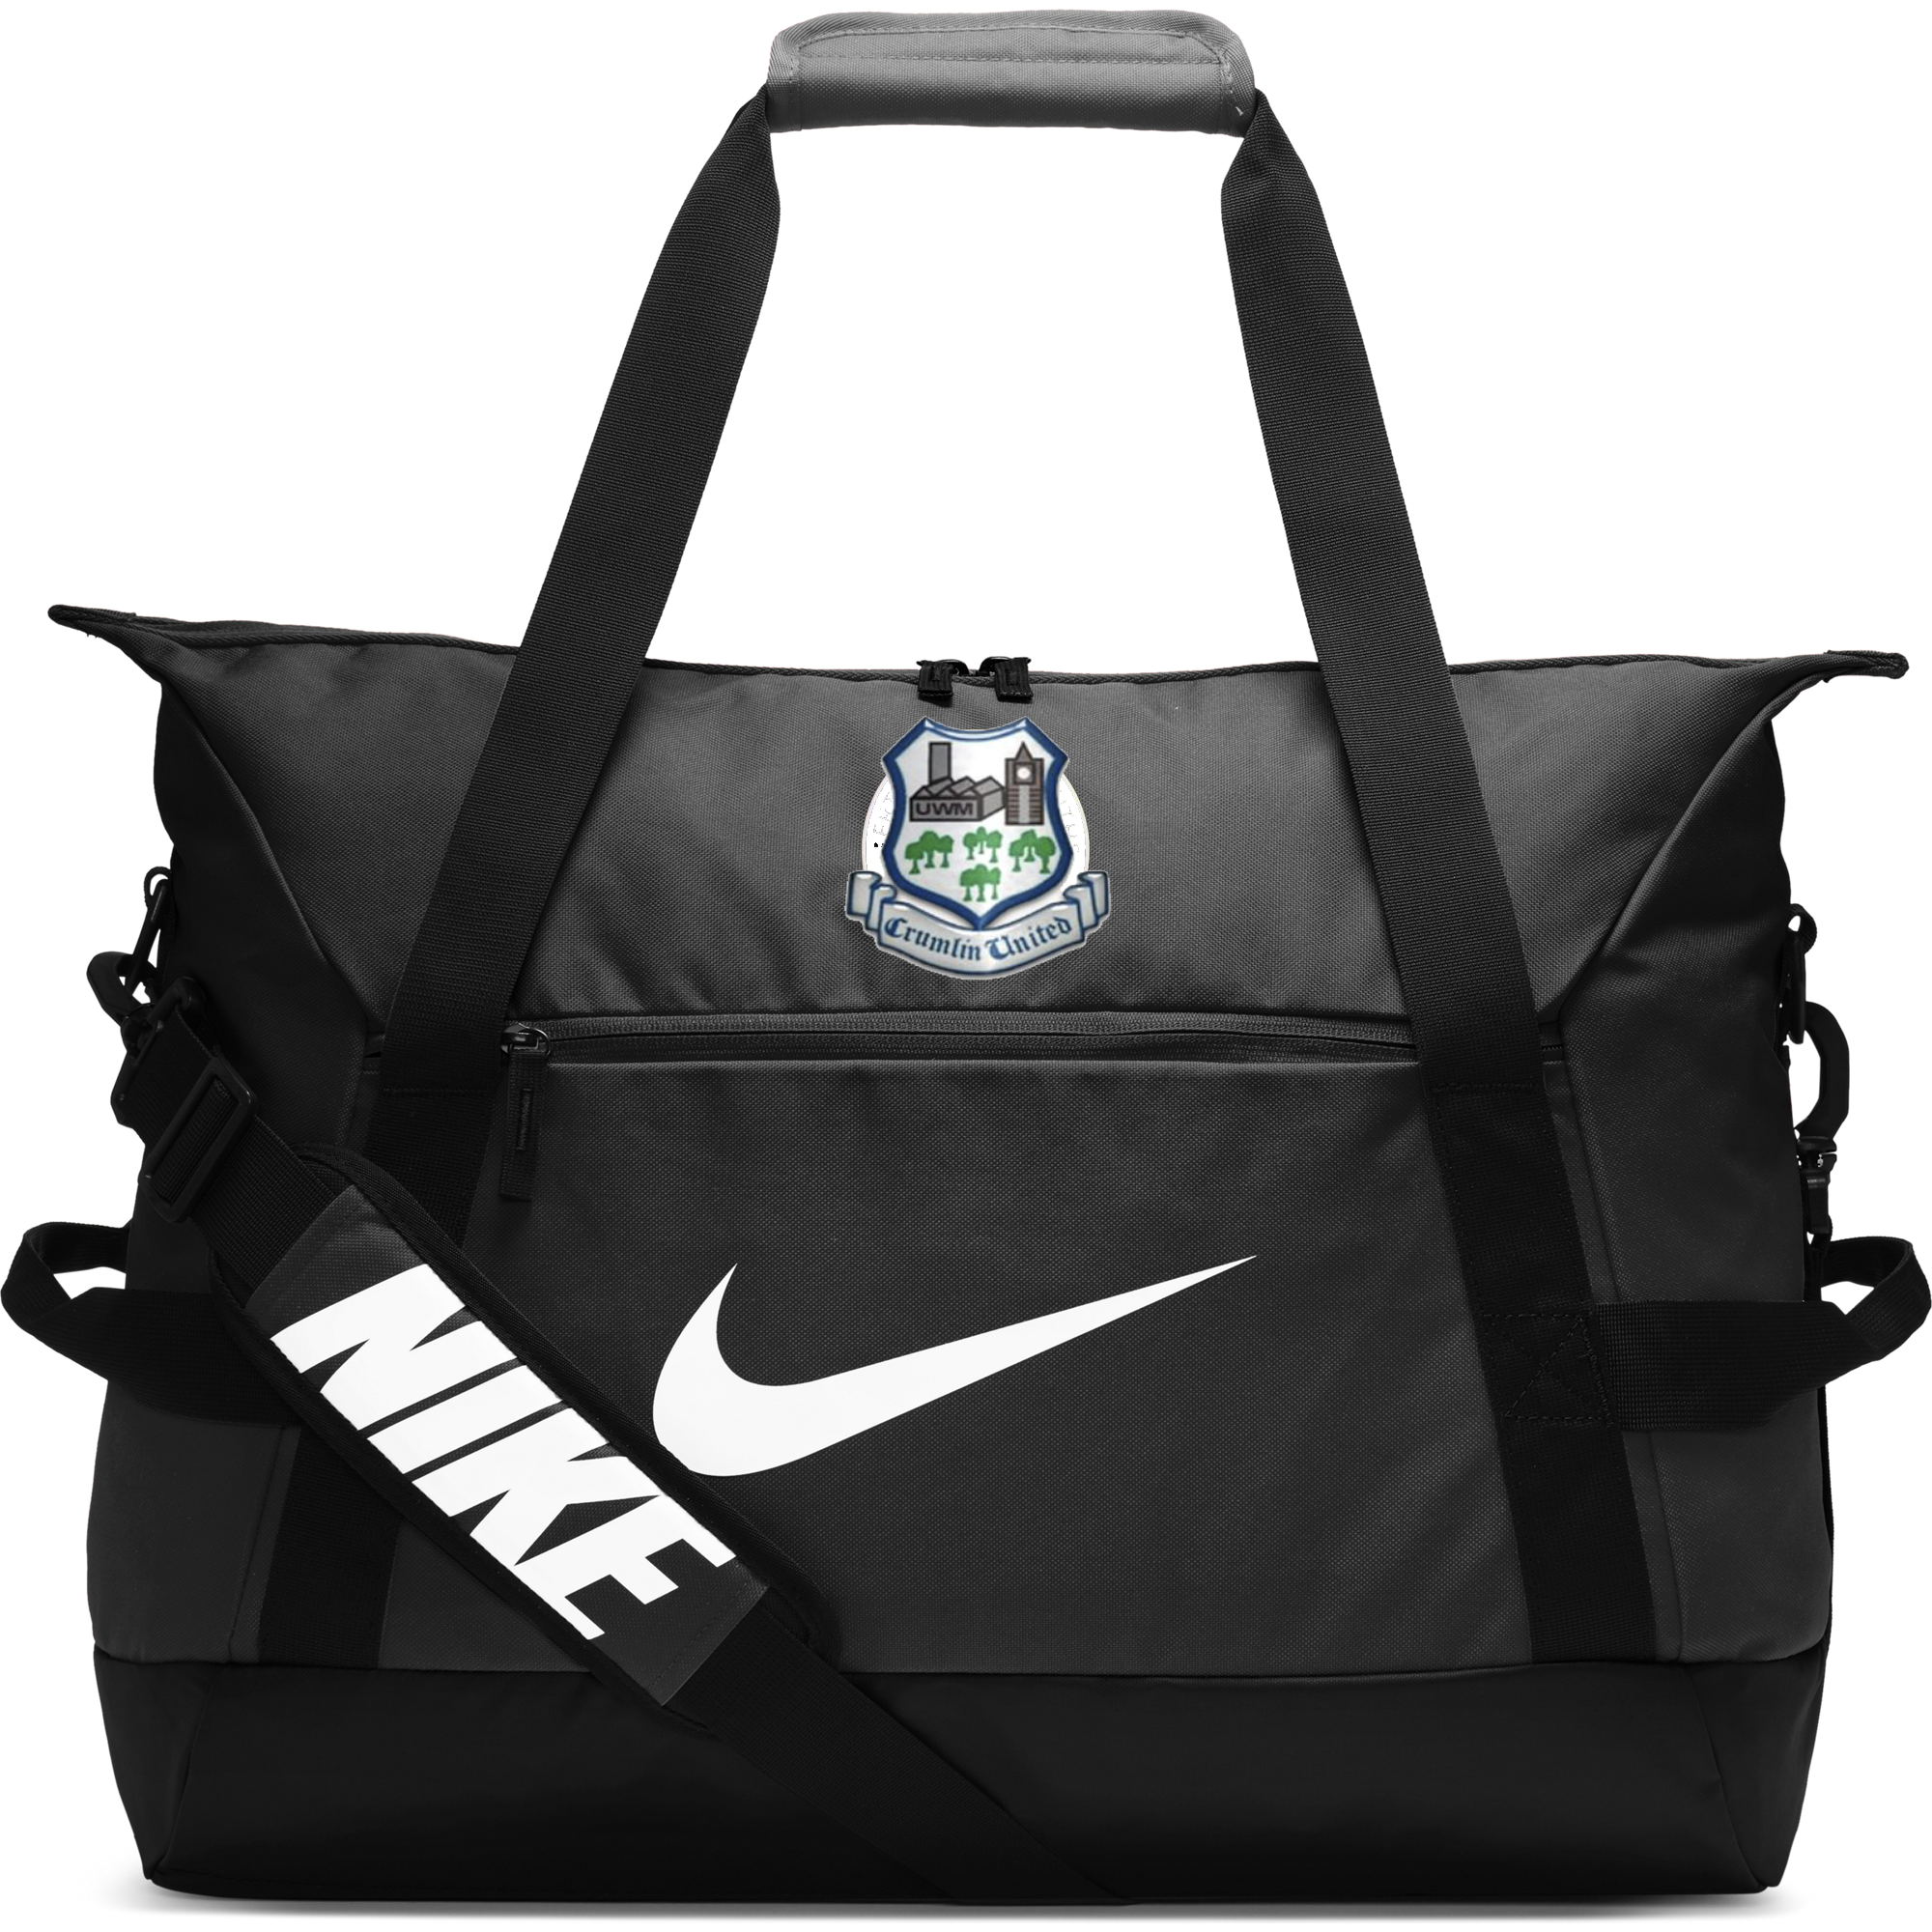 crumlin black duffel bag 26226 p